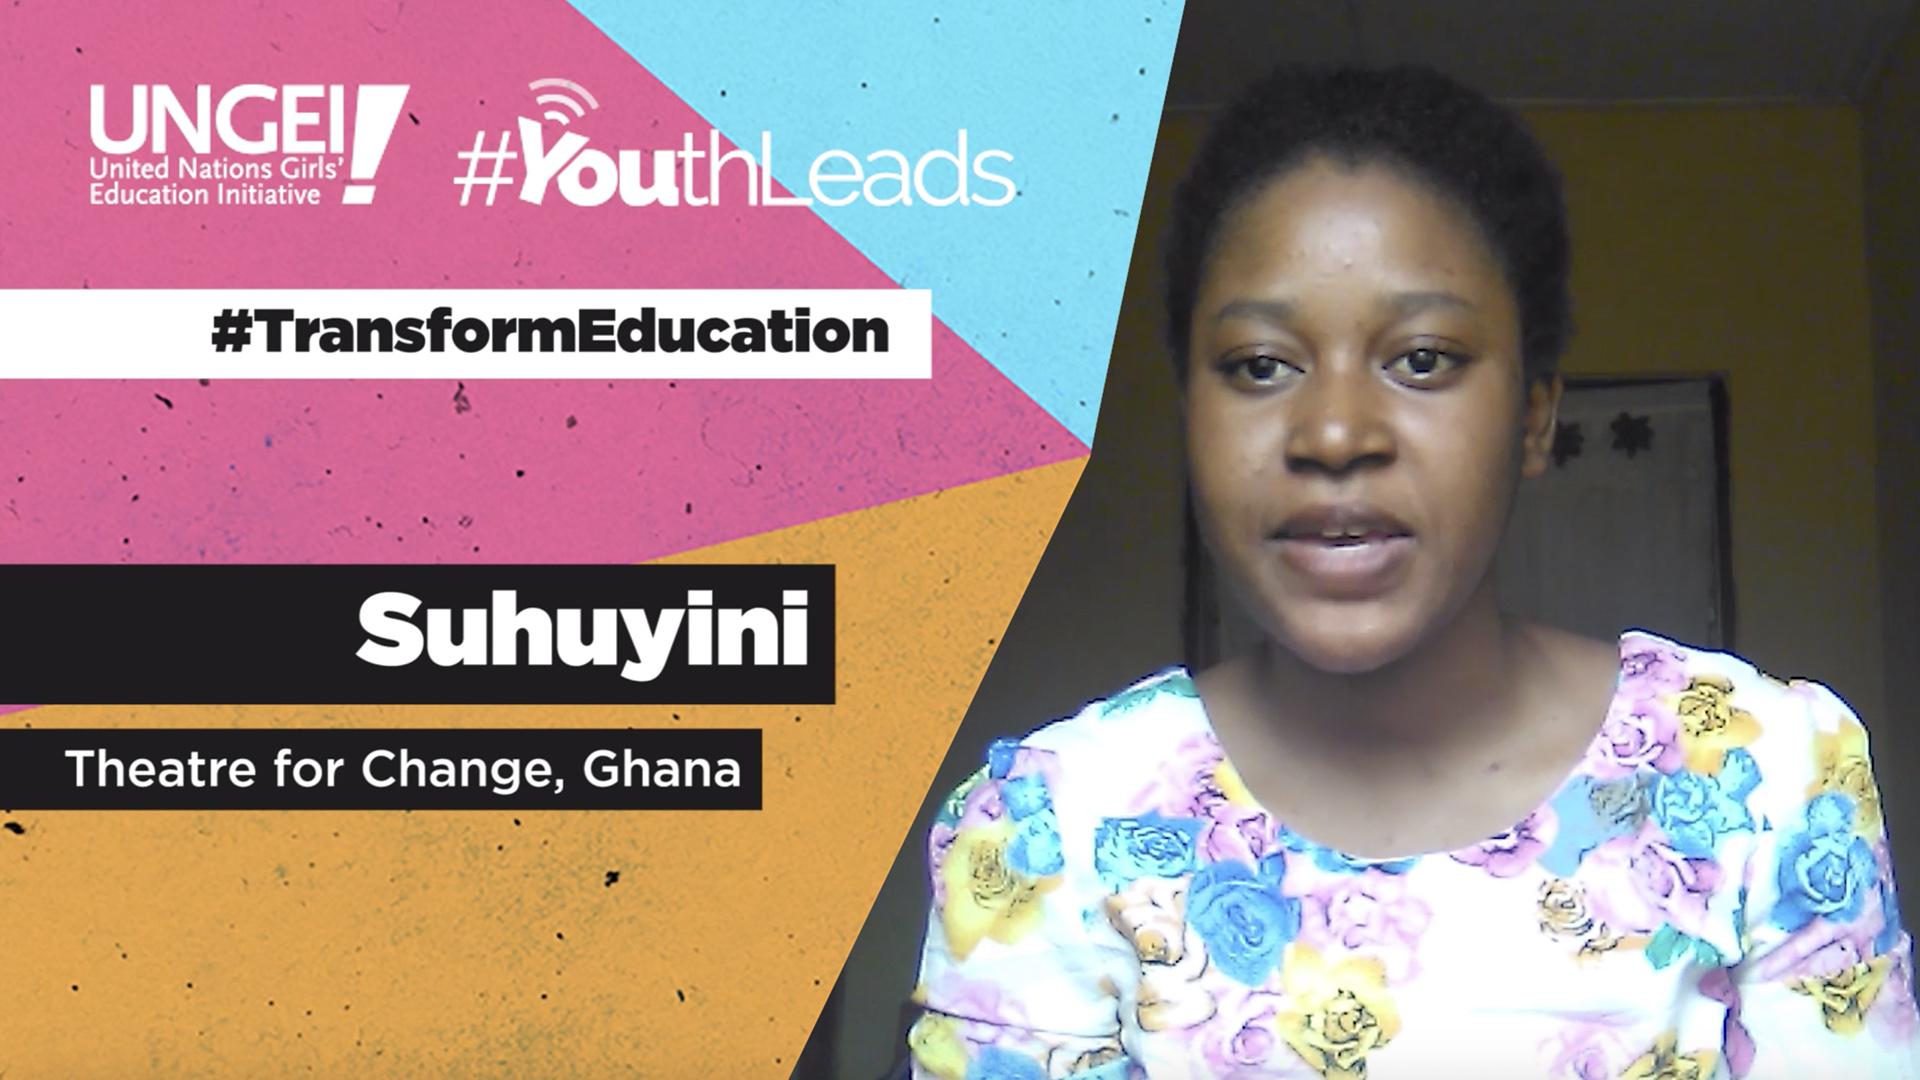 Suhuyini, Theatre for Change, Ghana